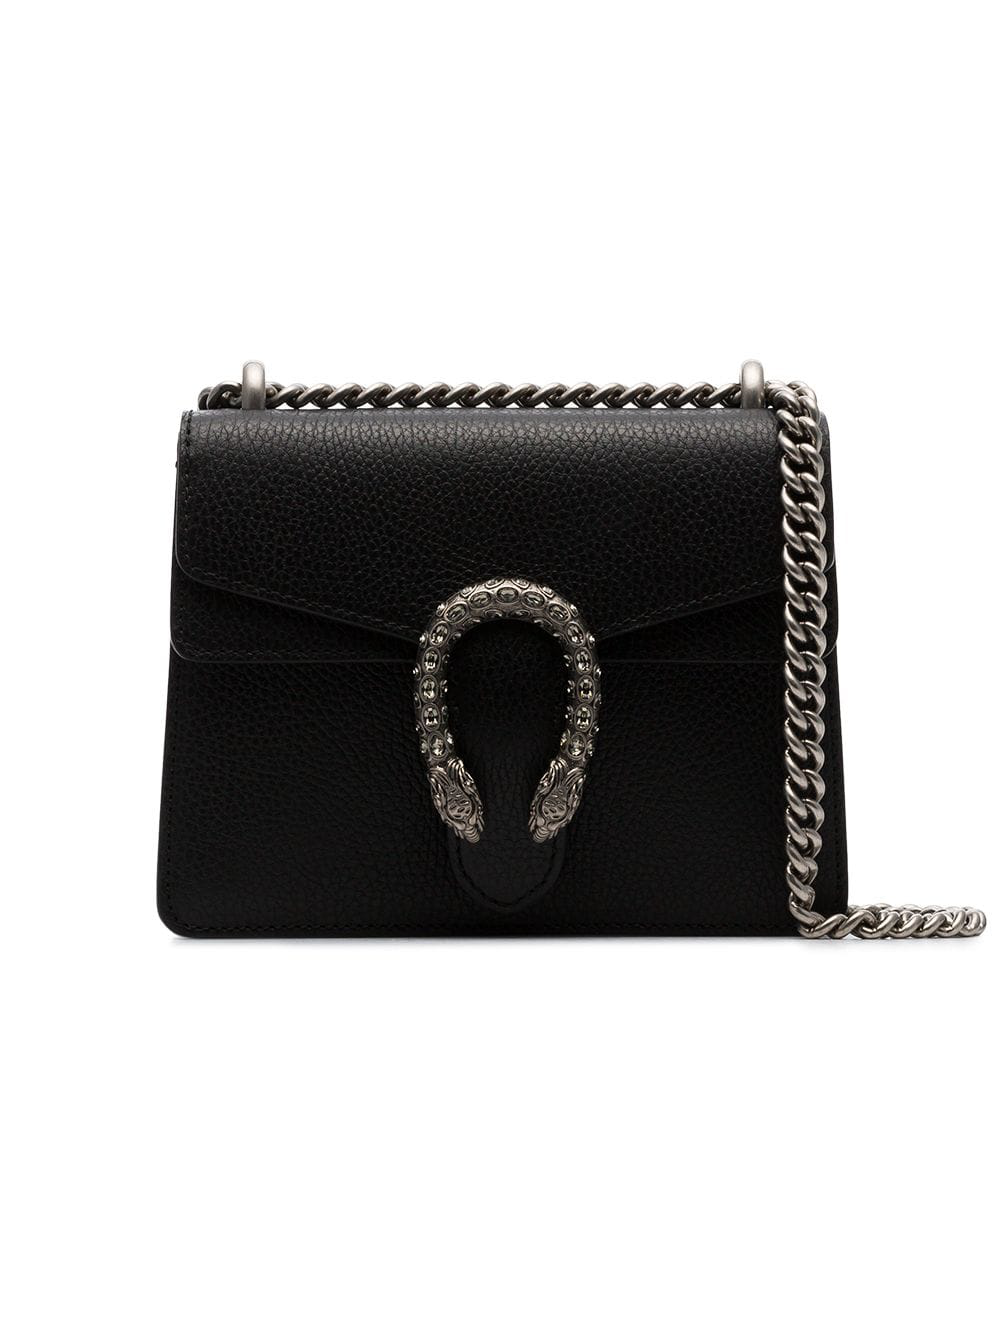 81650bd6fff Gucci Black Dionysus Mini Leather Shoulder Bag